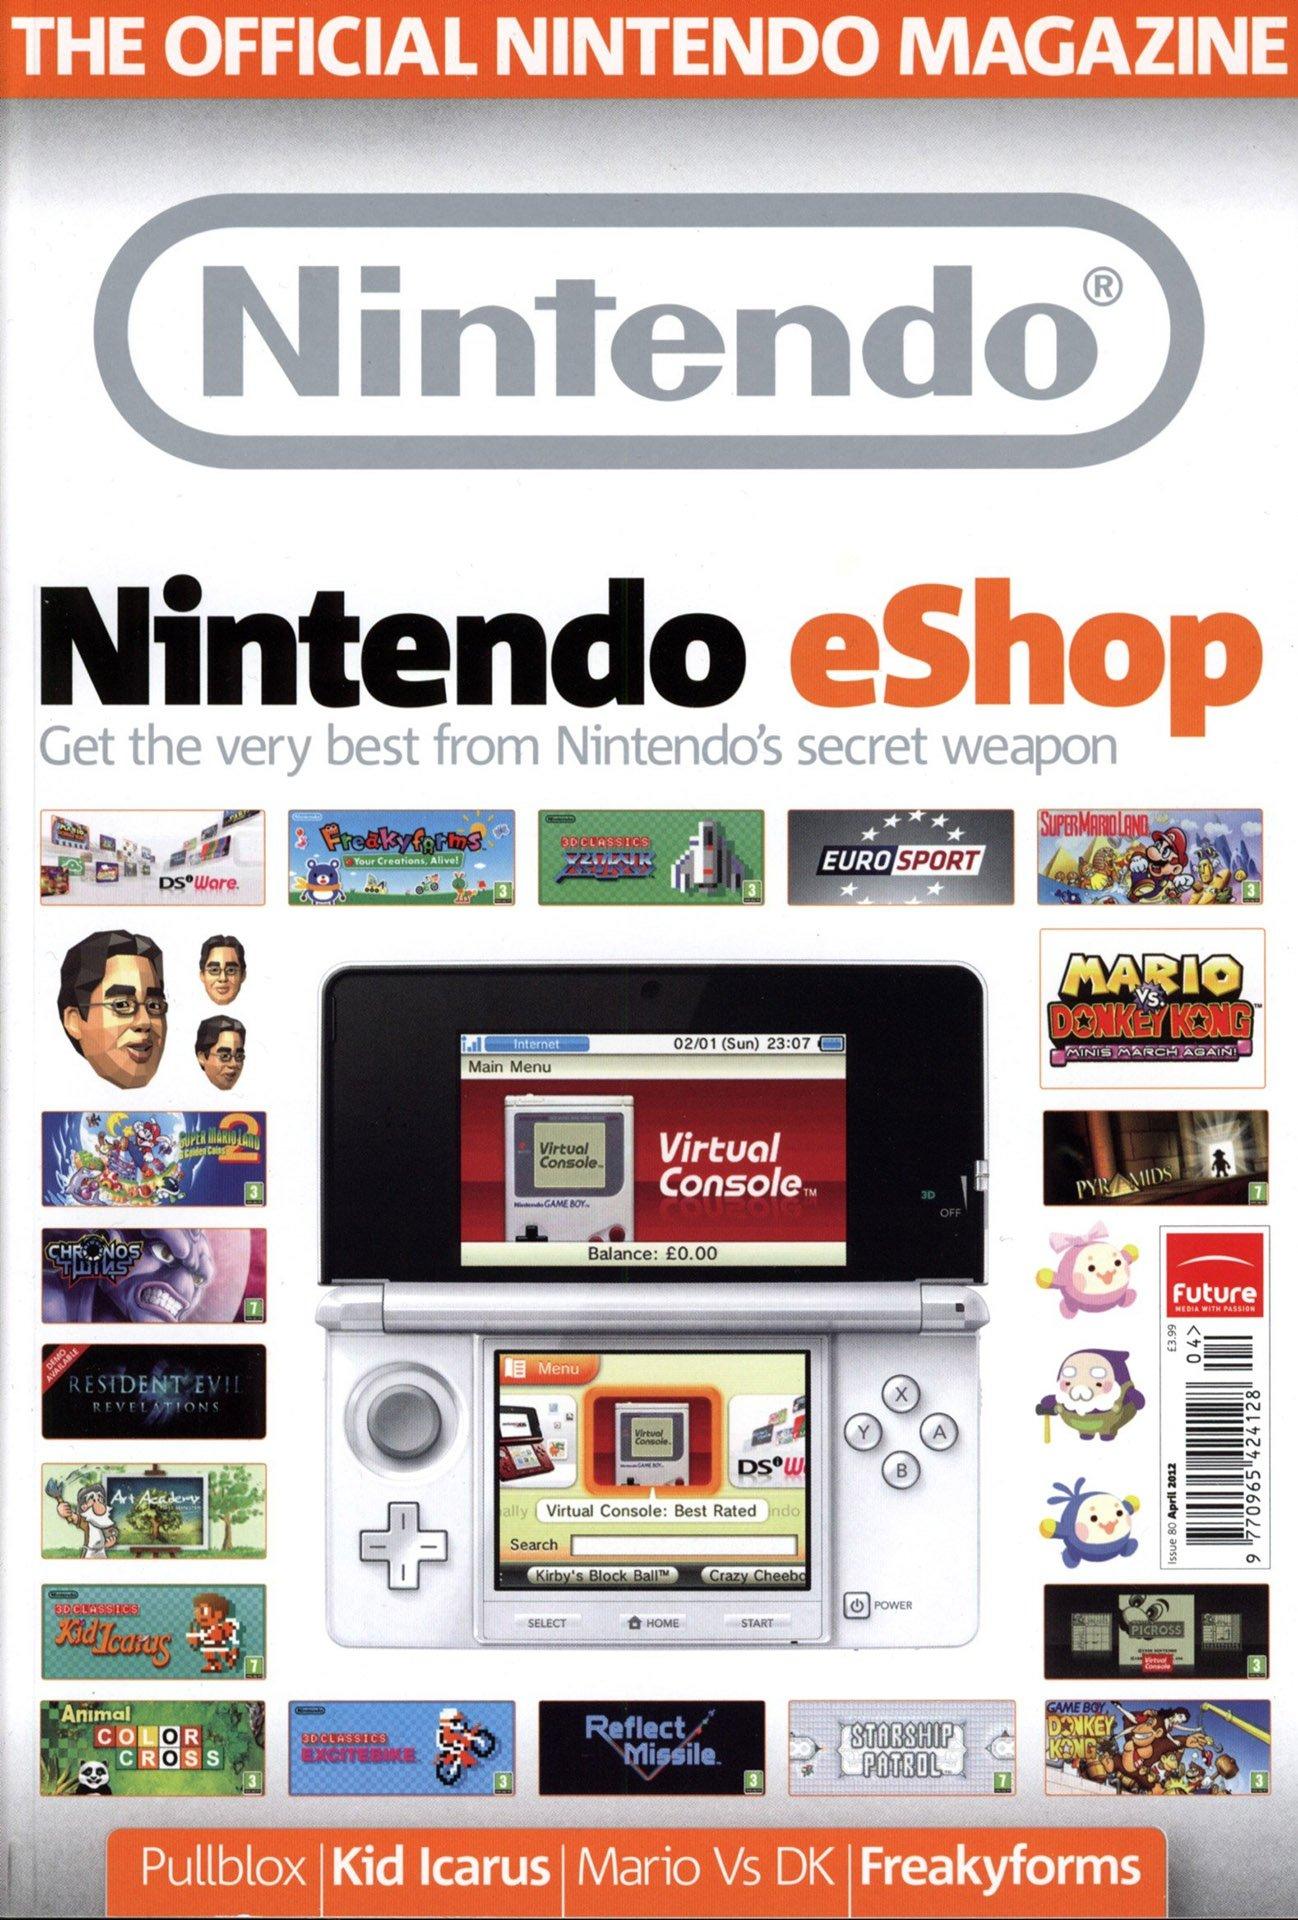 Official Nintendo Magazine 080 (April 2012)